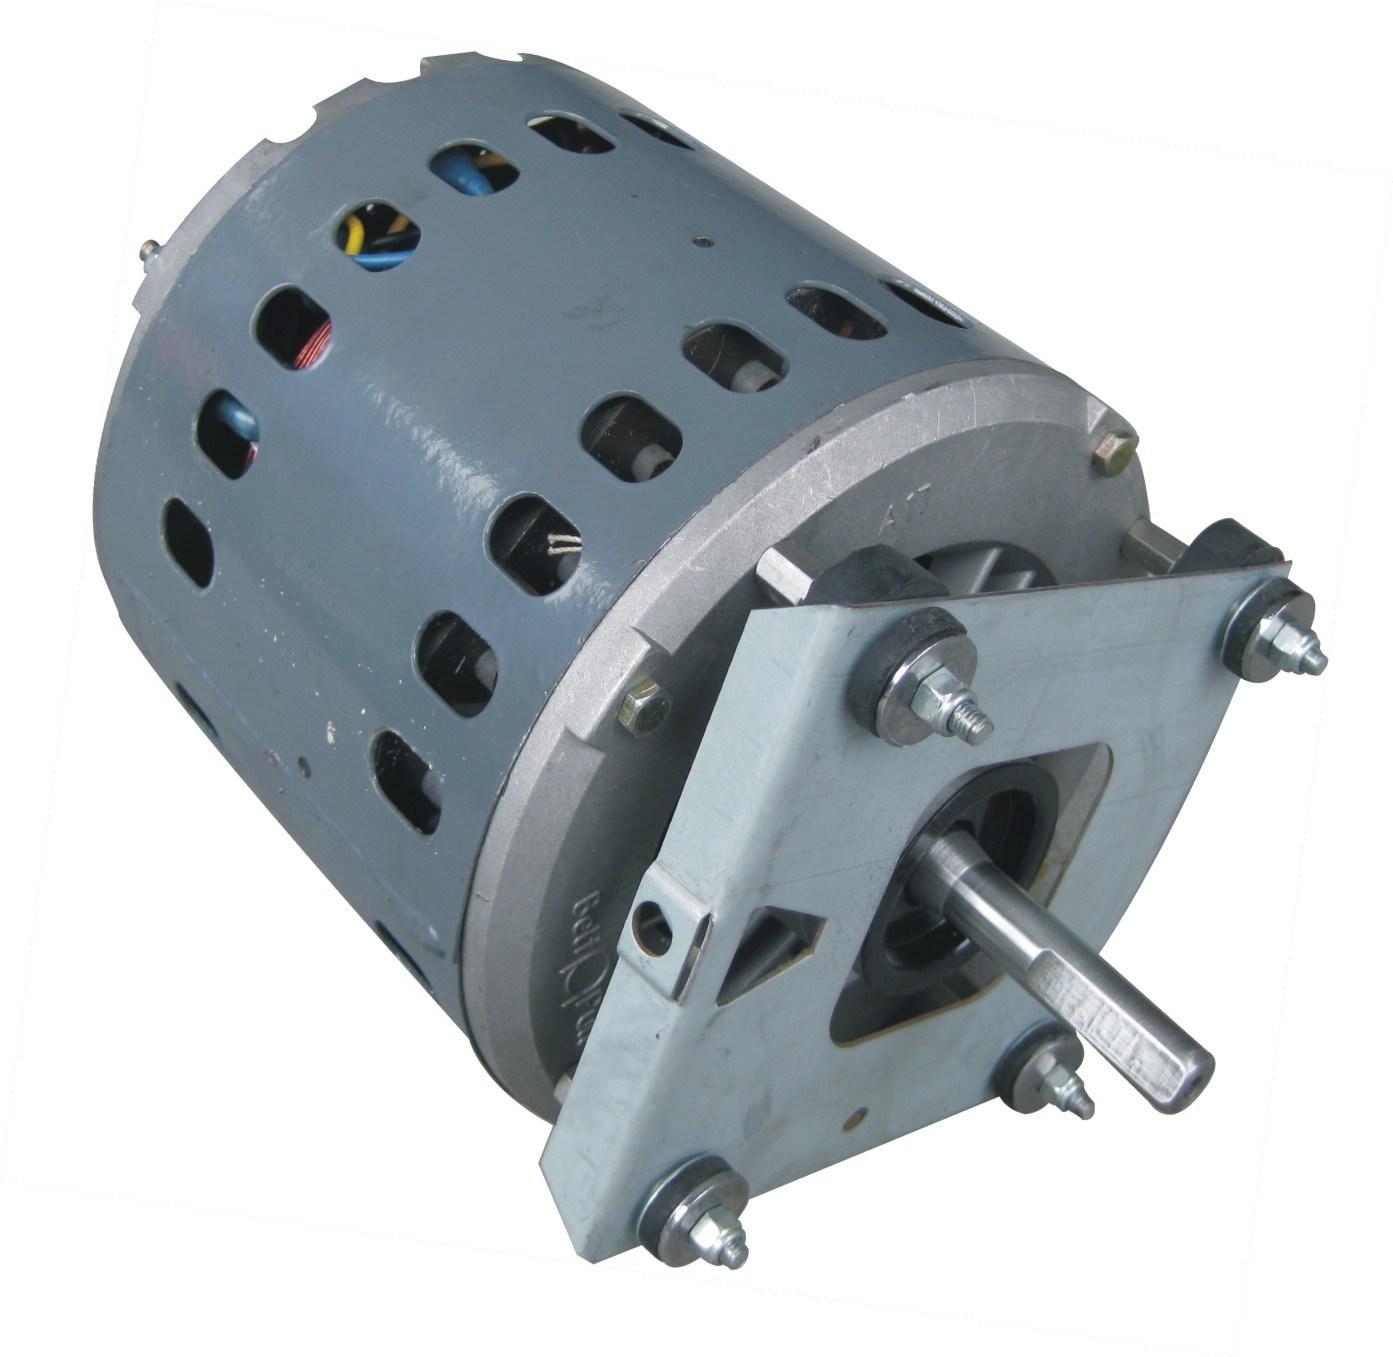 Cooler Motor Lb Ecm160f China Evaporative Cooler Motor